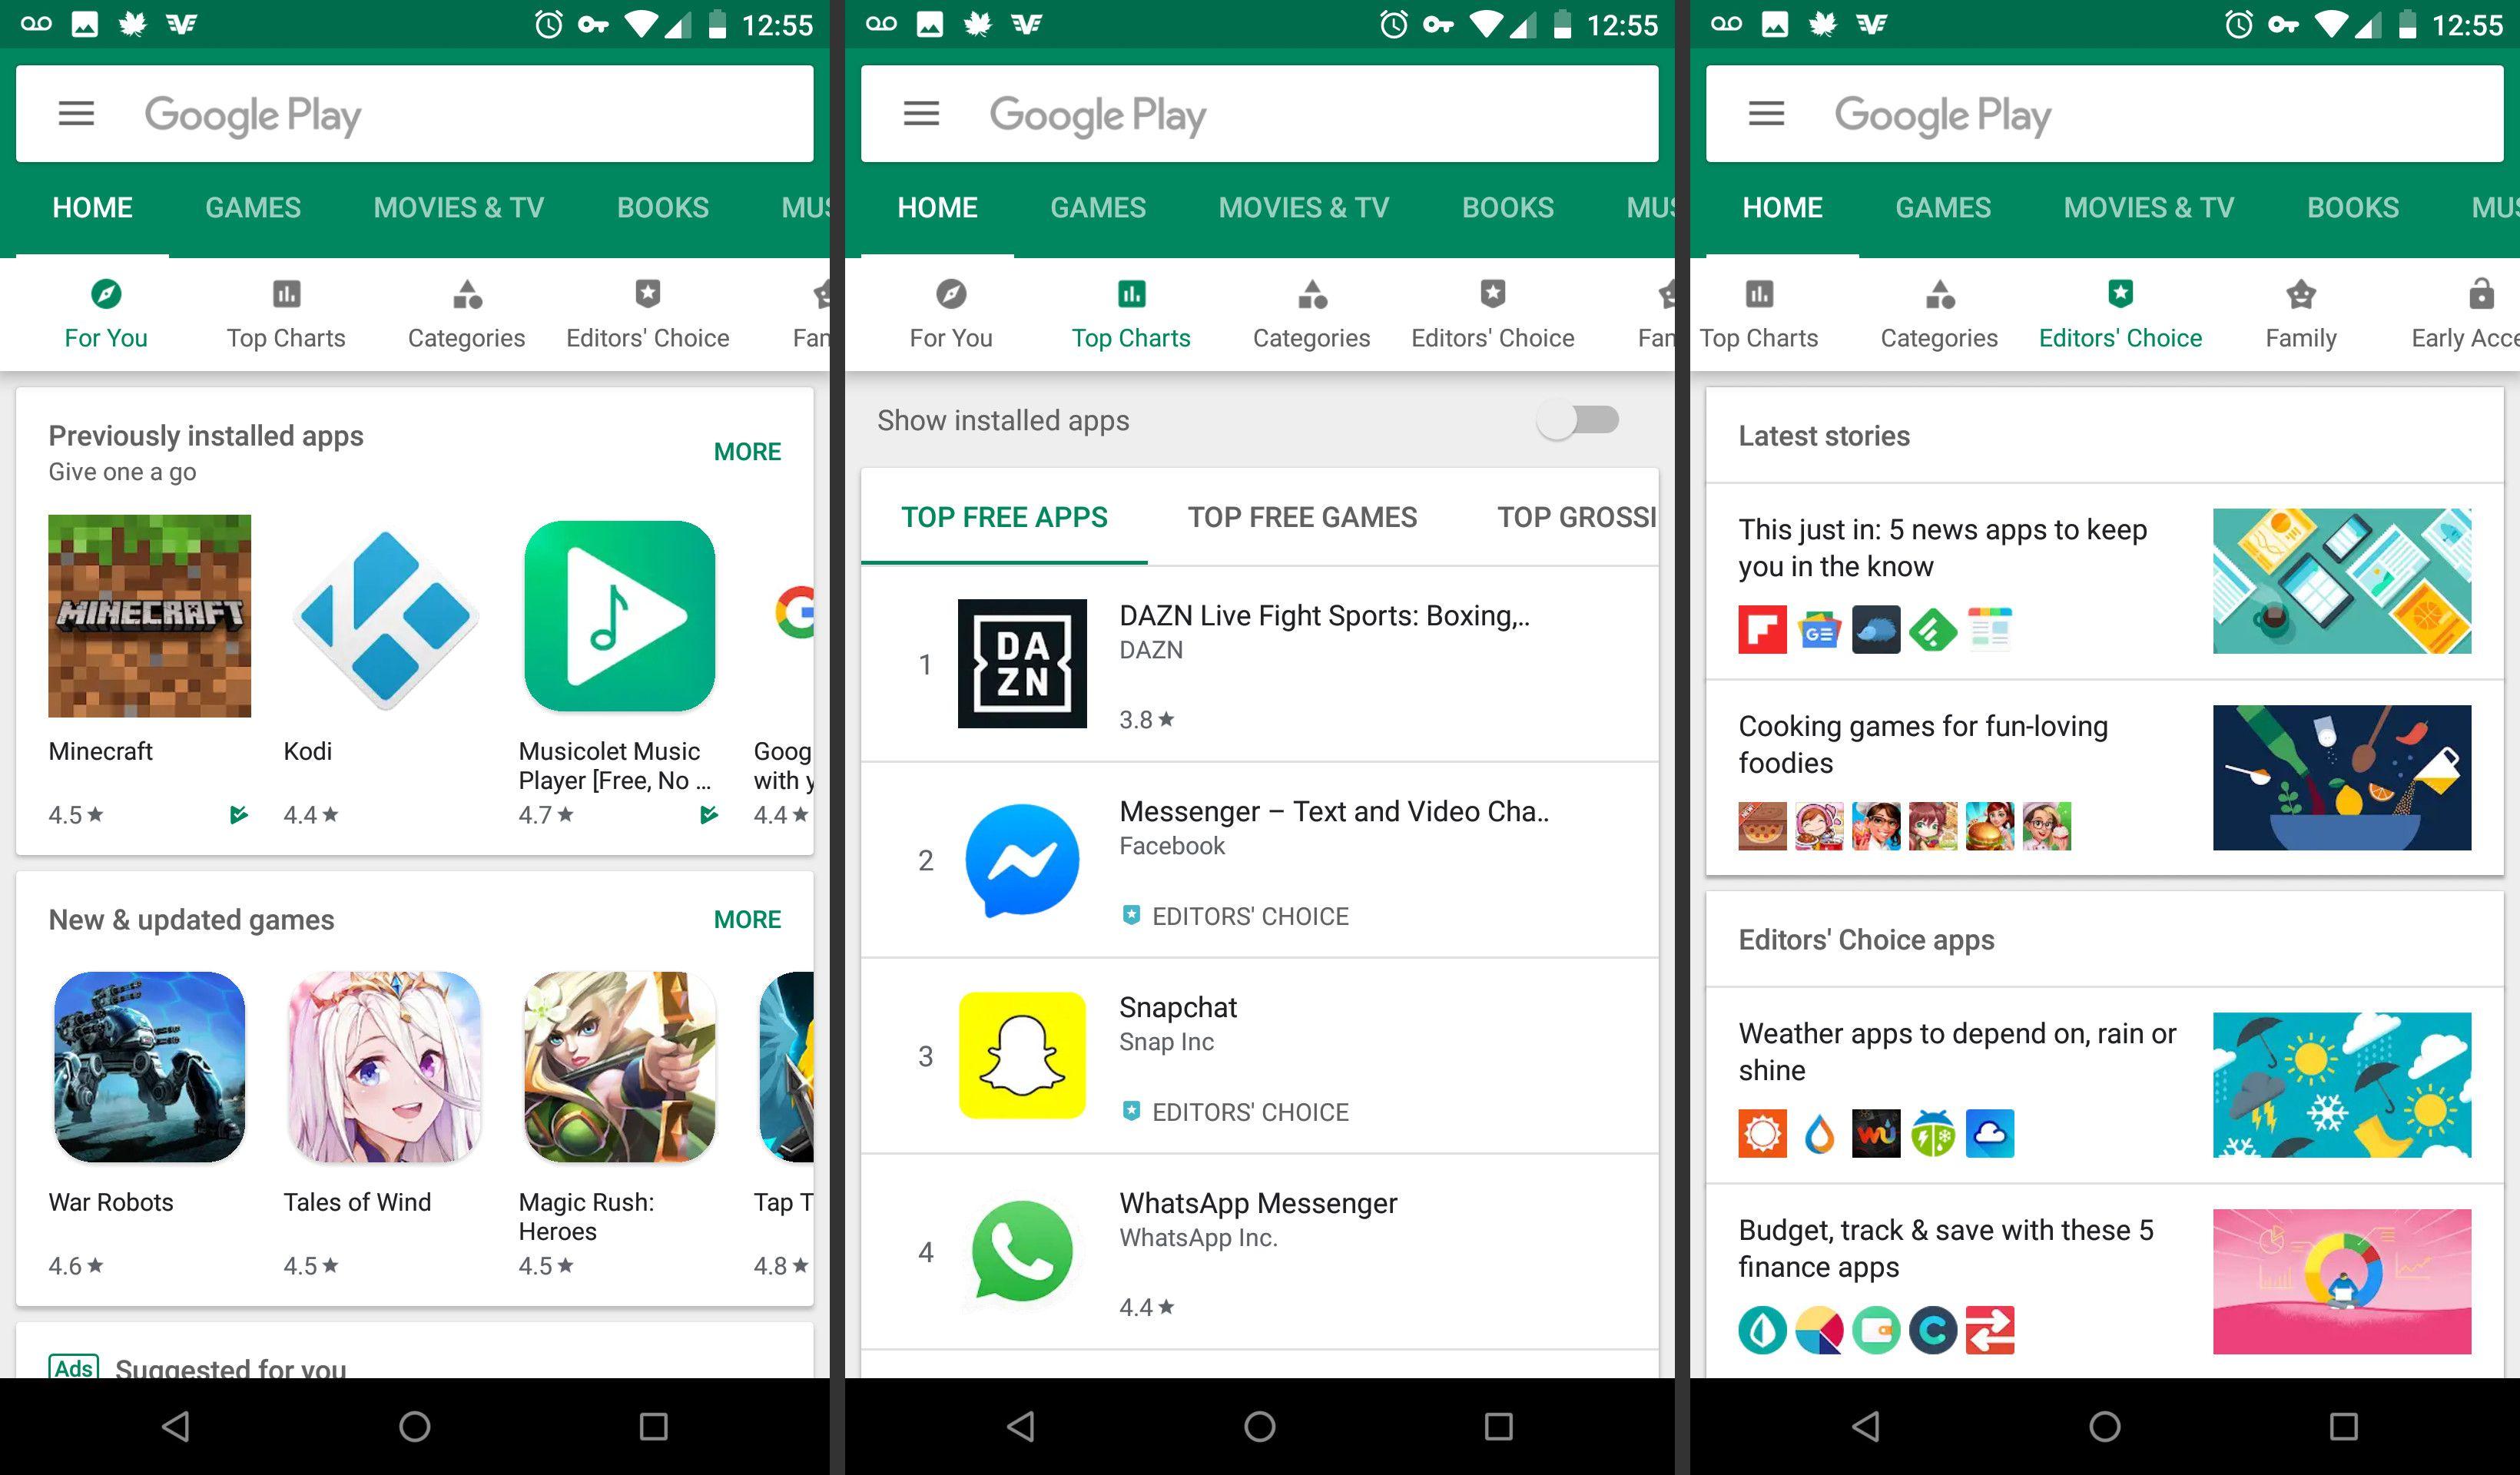 Google Play Store home screen